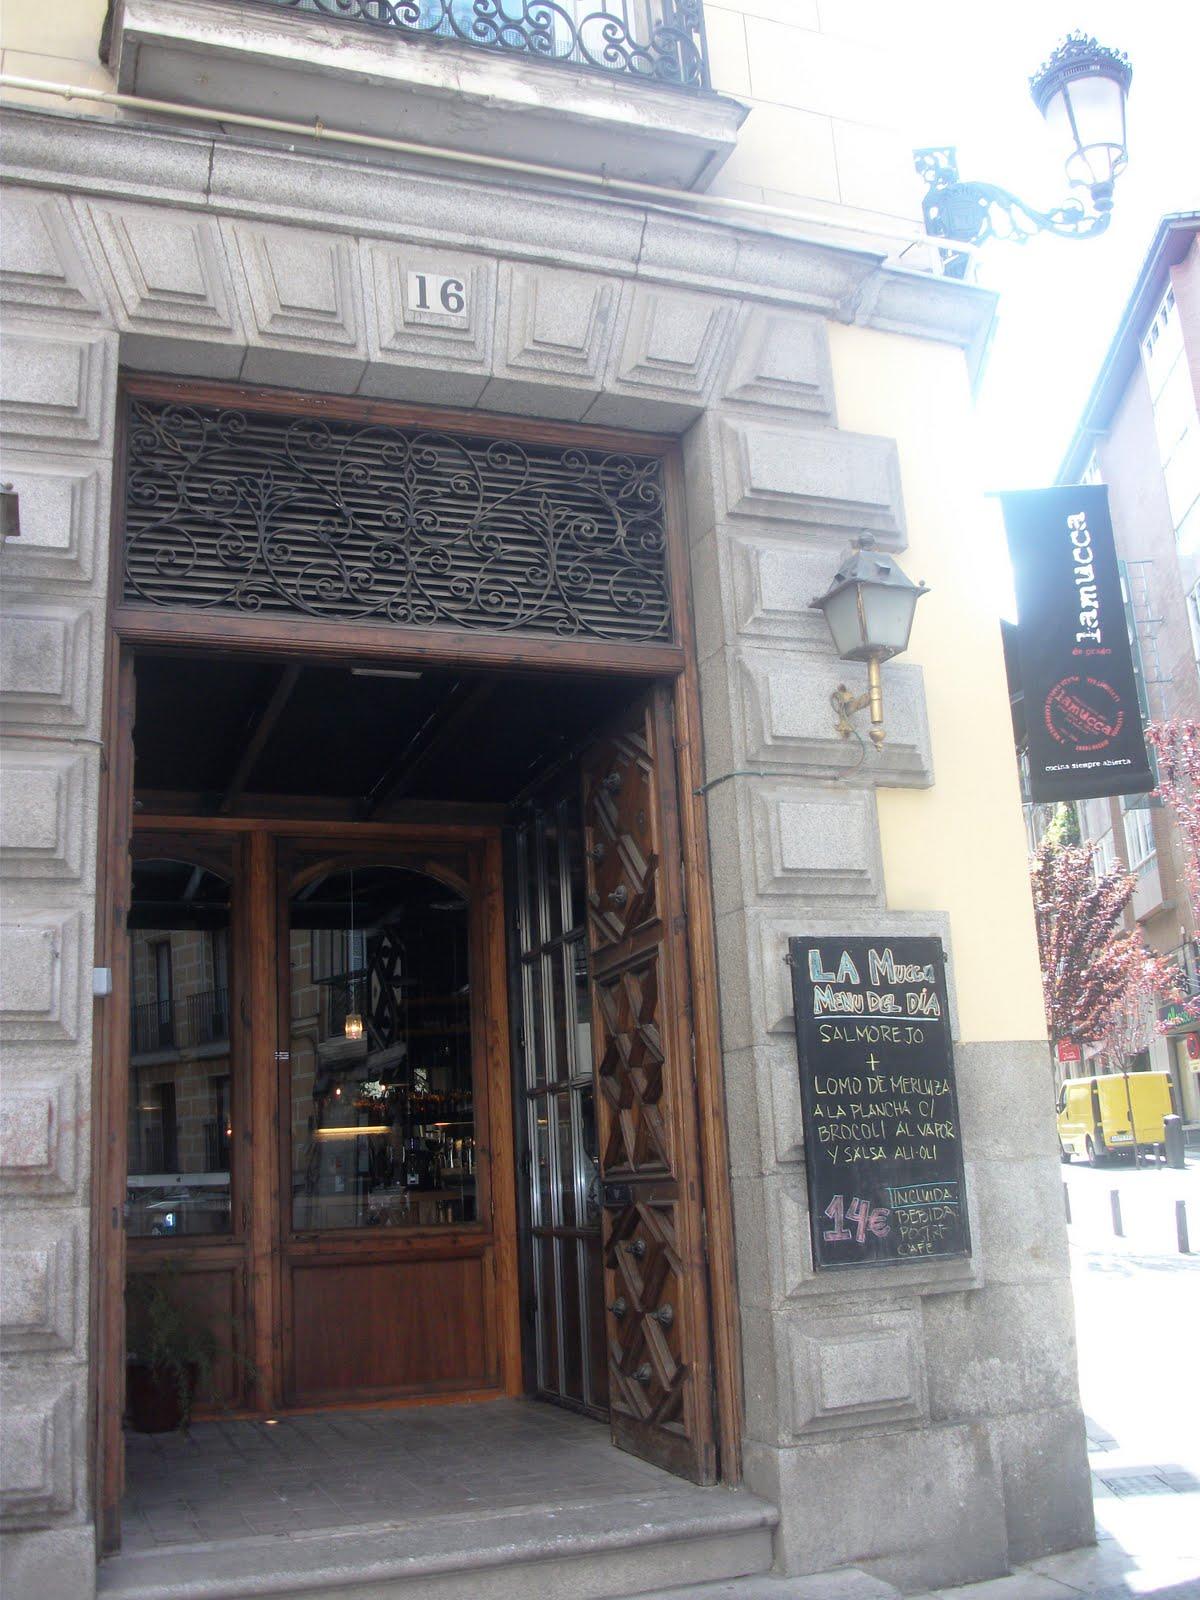 Me gusta madrid me gusta lamucca for Restaurante lamucca calle prado madrid